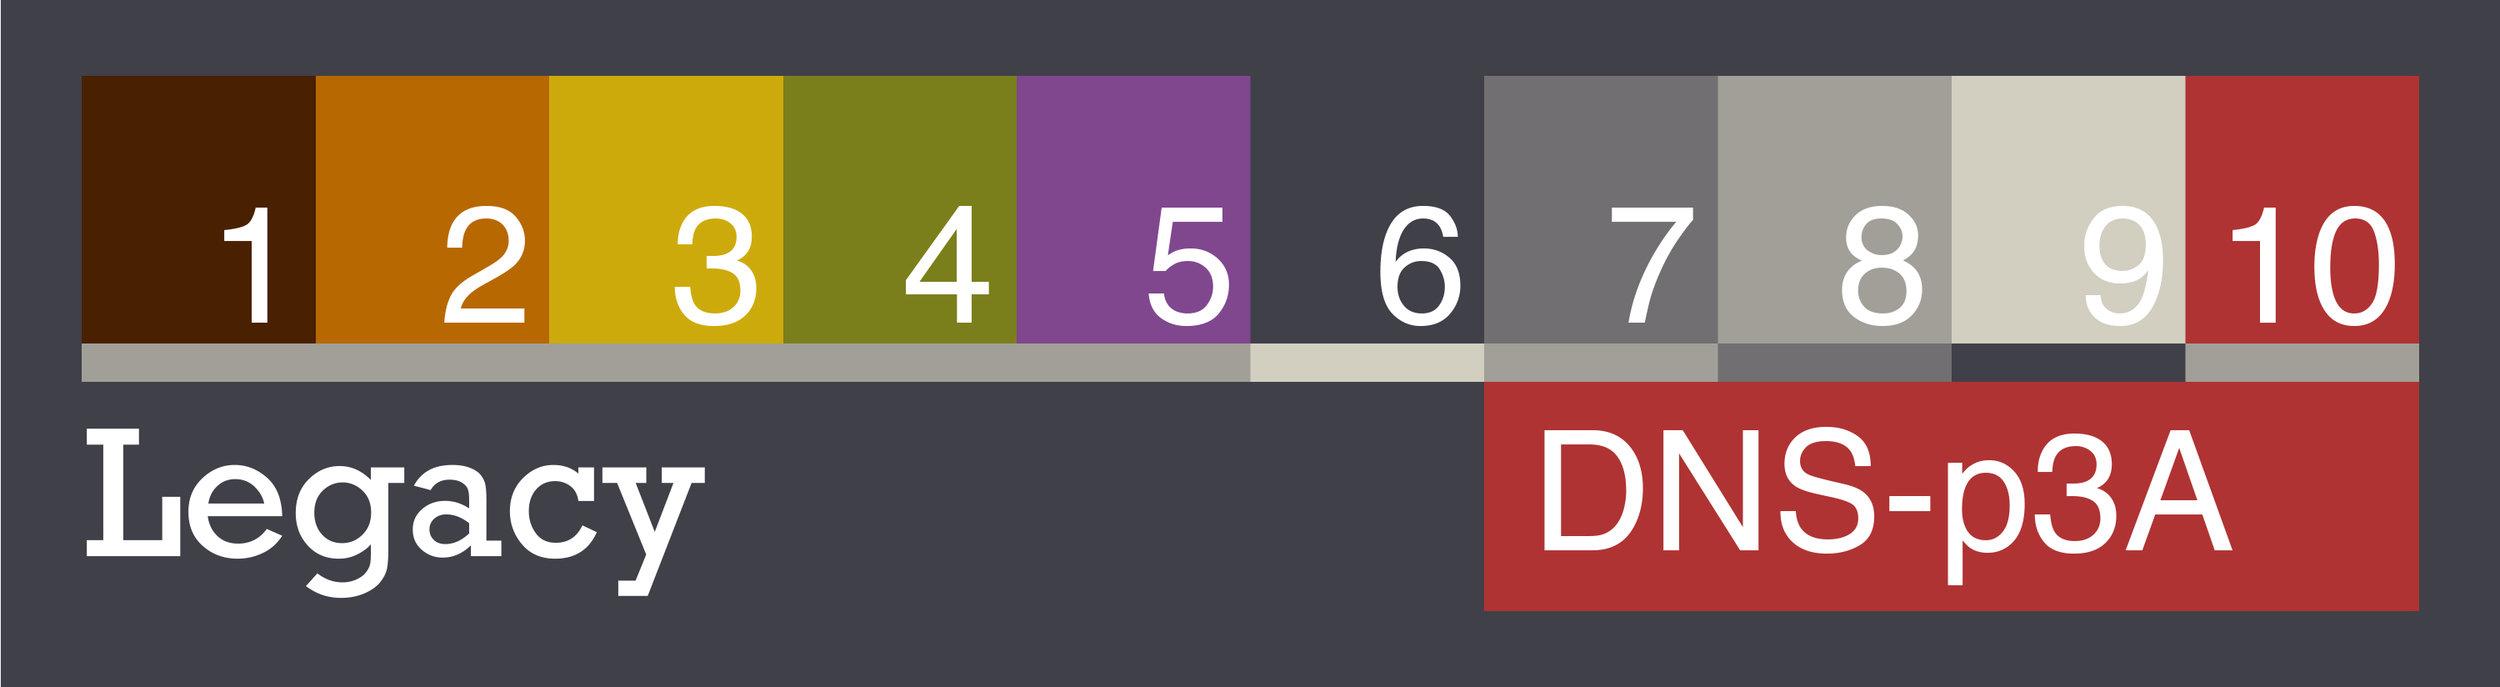 Bank A Color Bar.jpg